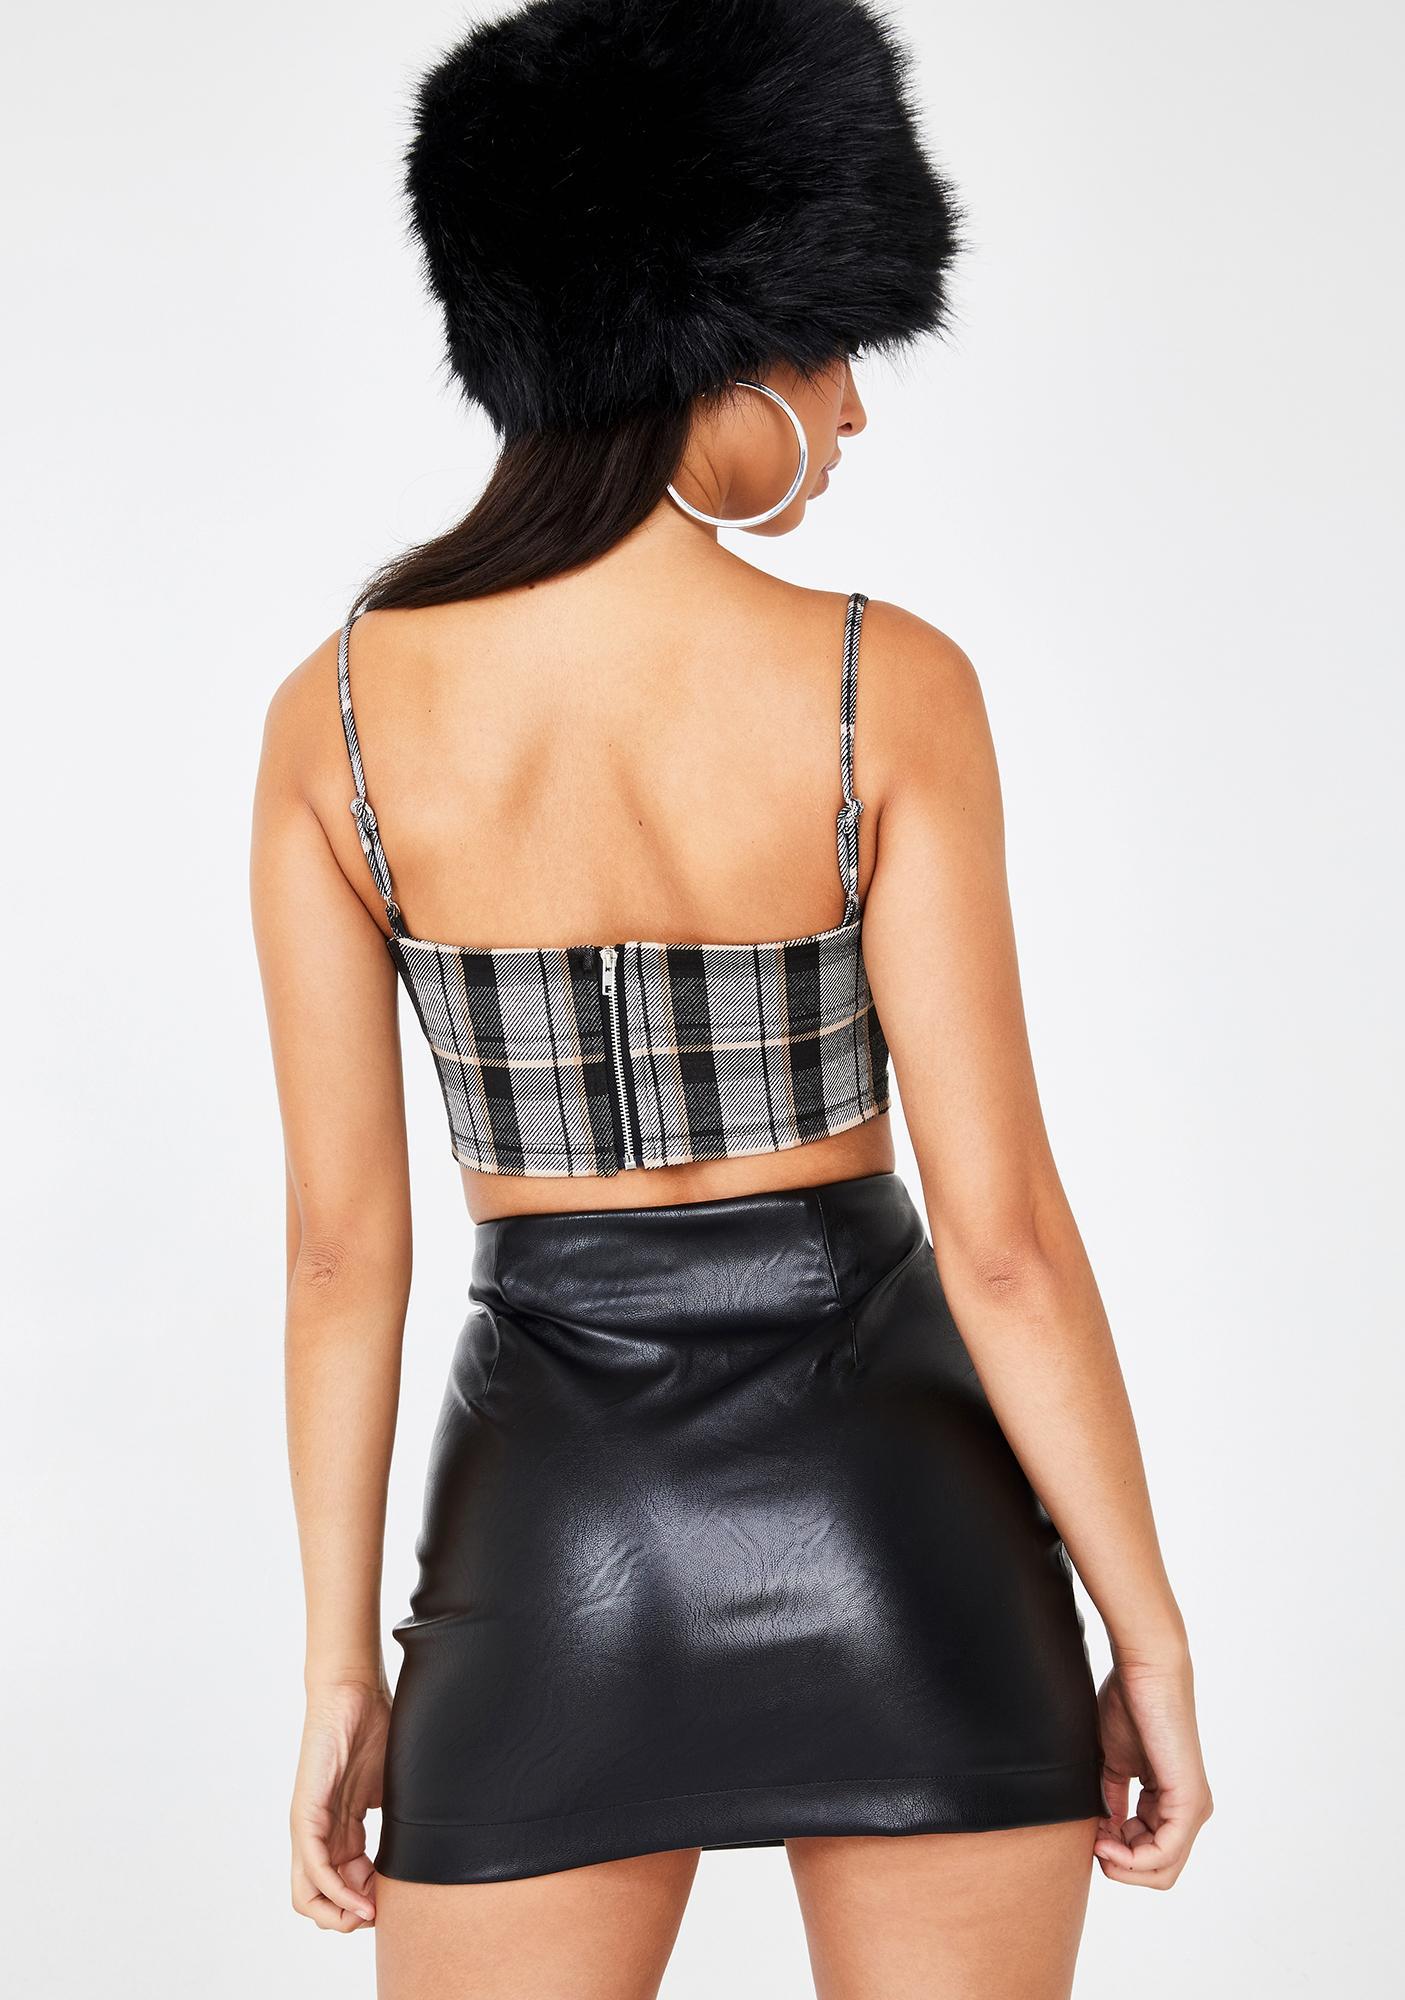 Tiger Mist Clara Faux Leather Skirt